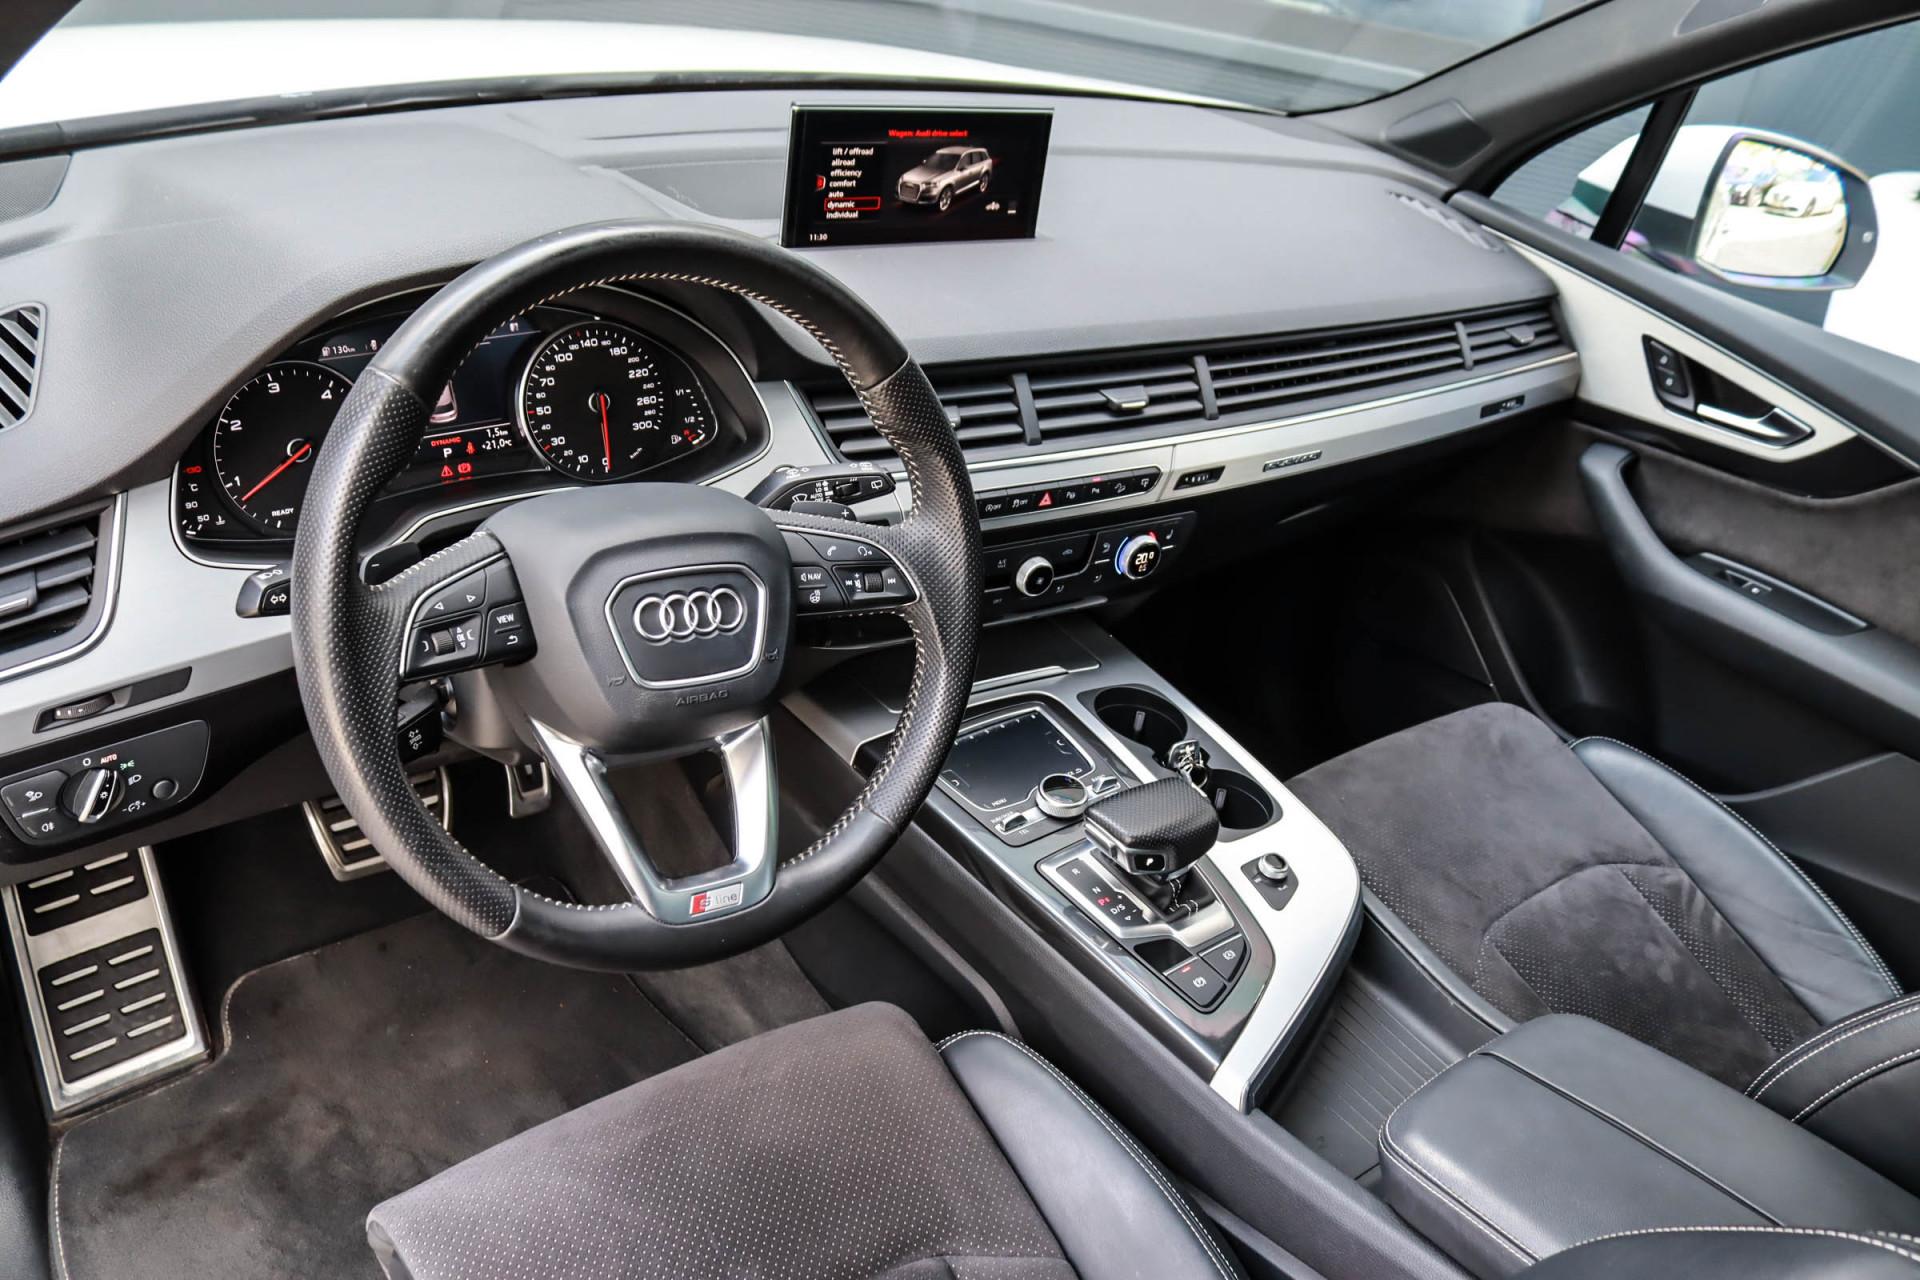 Tweedehands Audi Q7 occasion